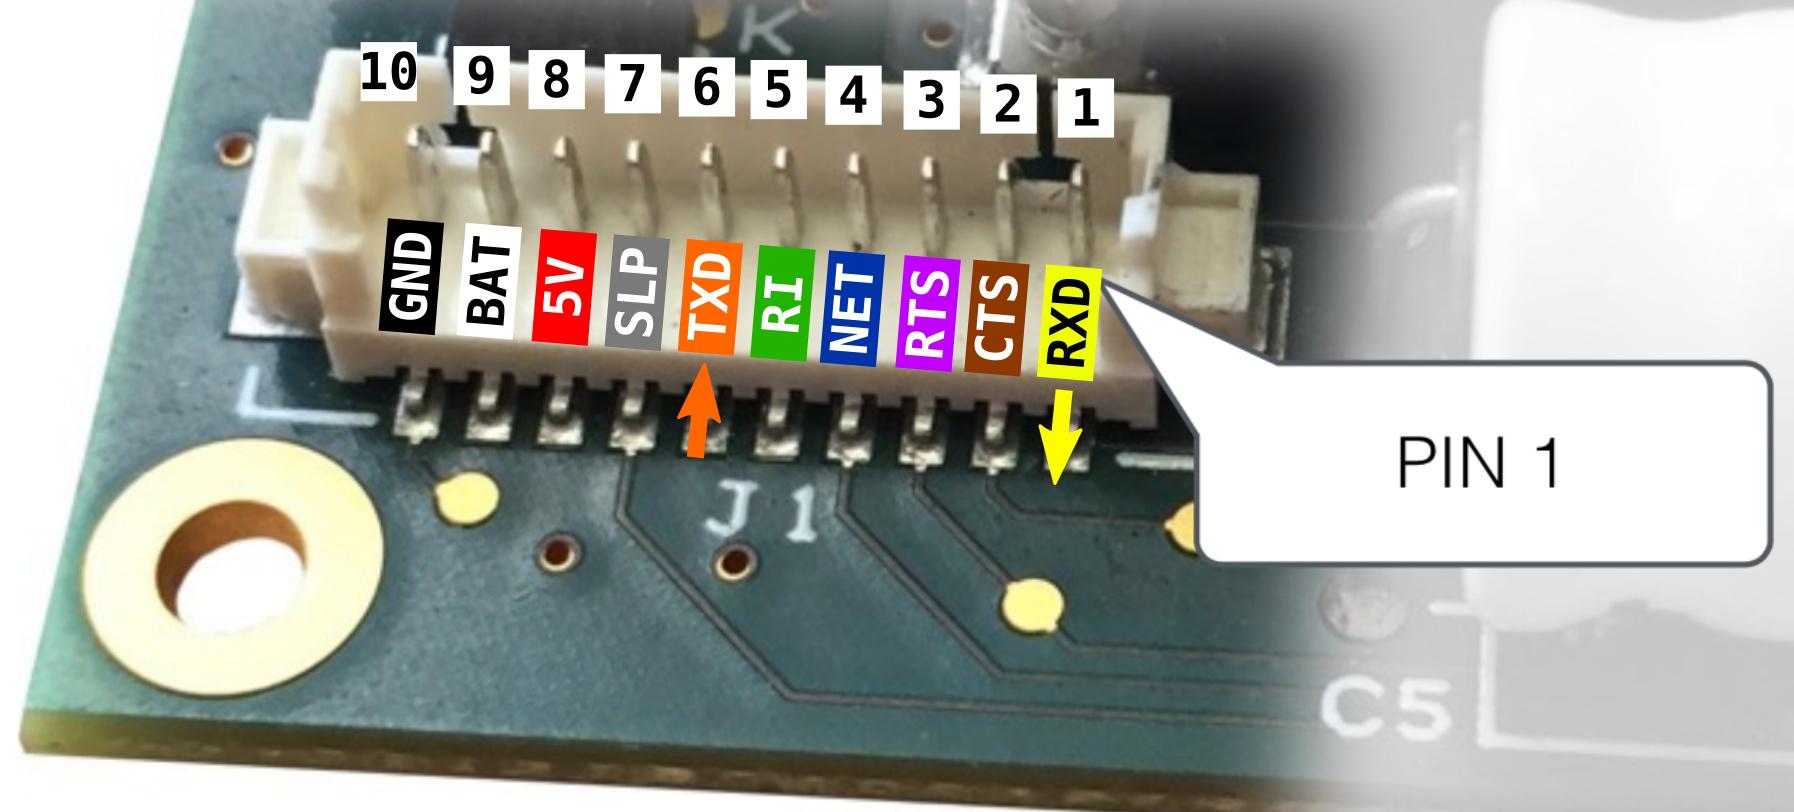 sensors_rockblock_9603_pins.jpg